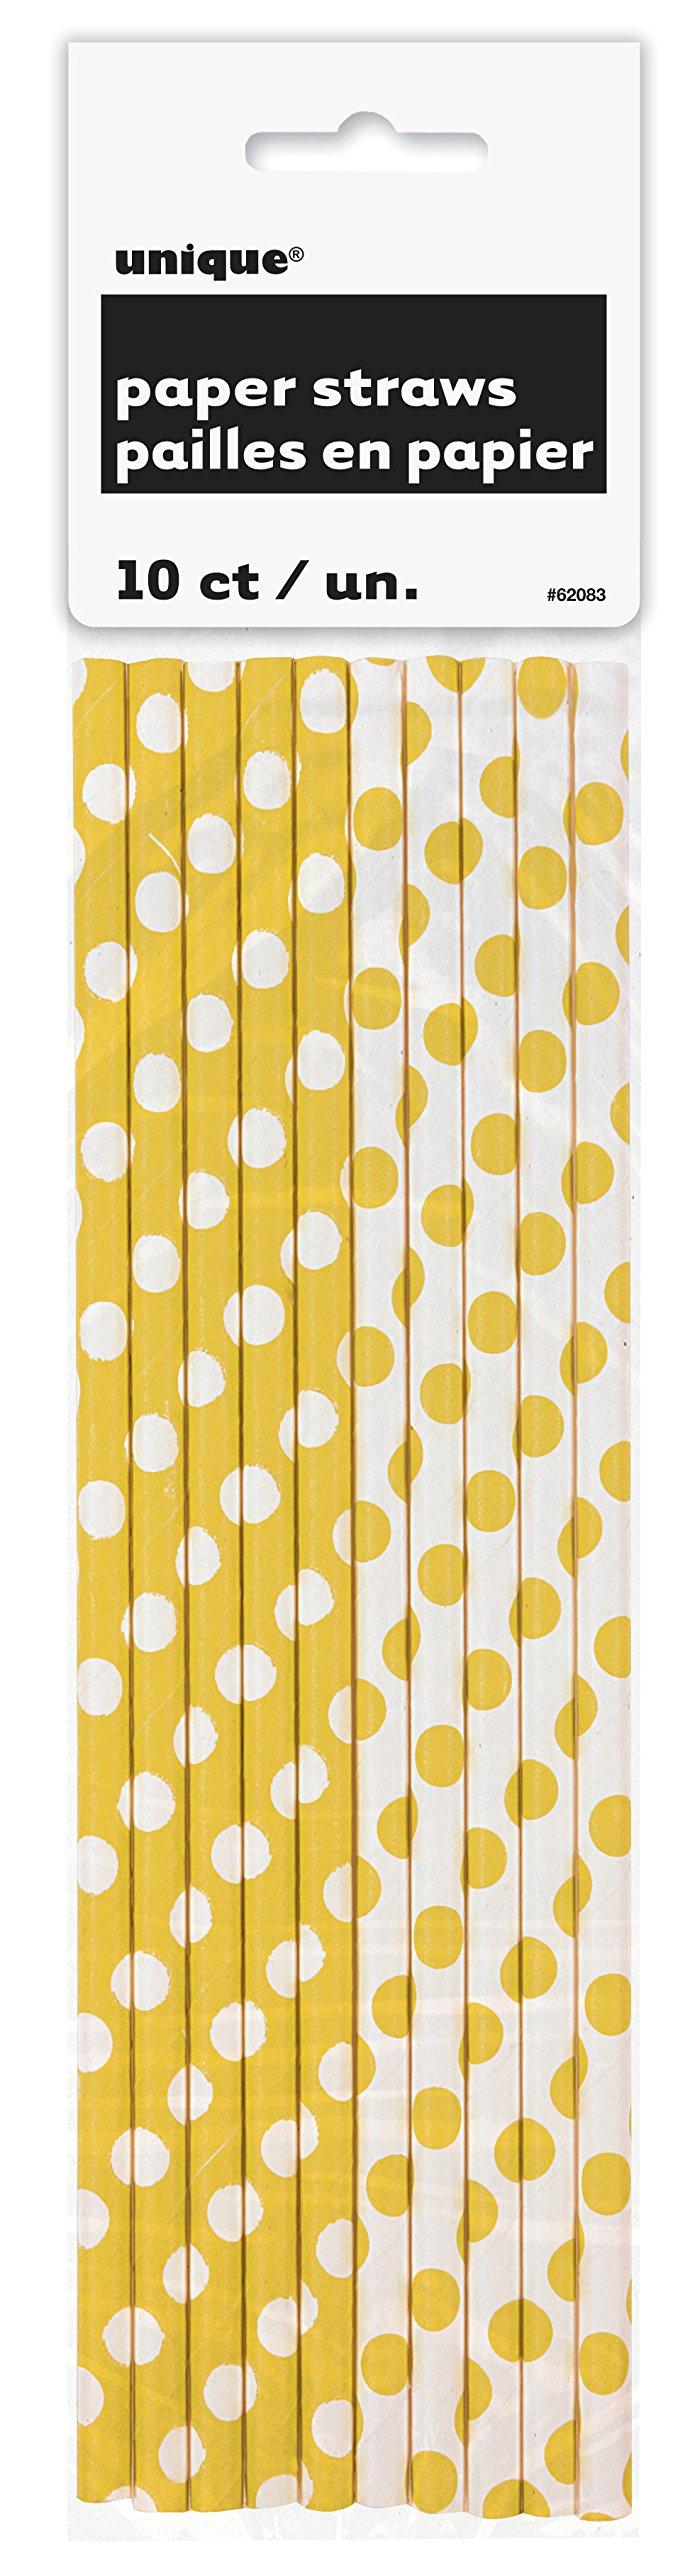 Yellow Polka Dot Paper Straws, 10ct